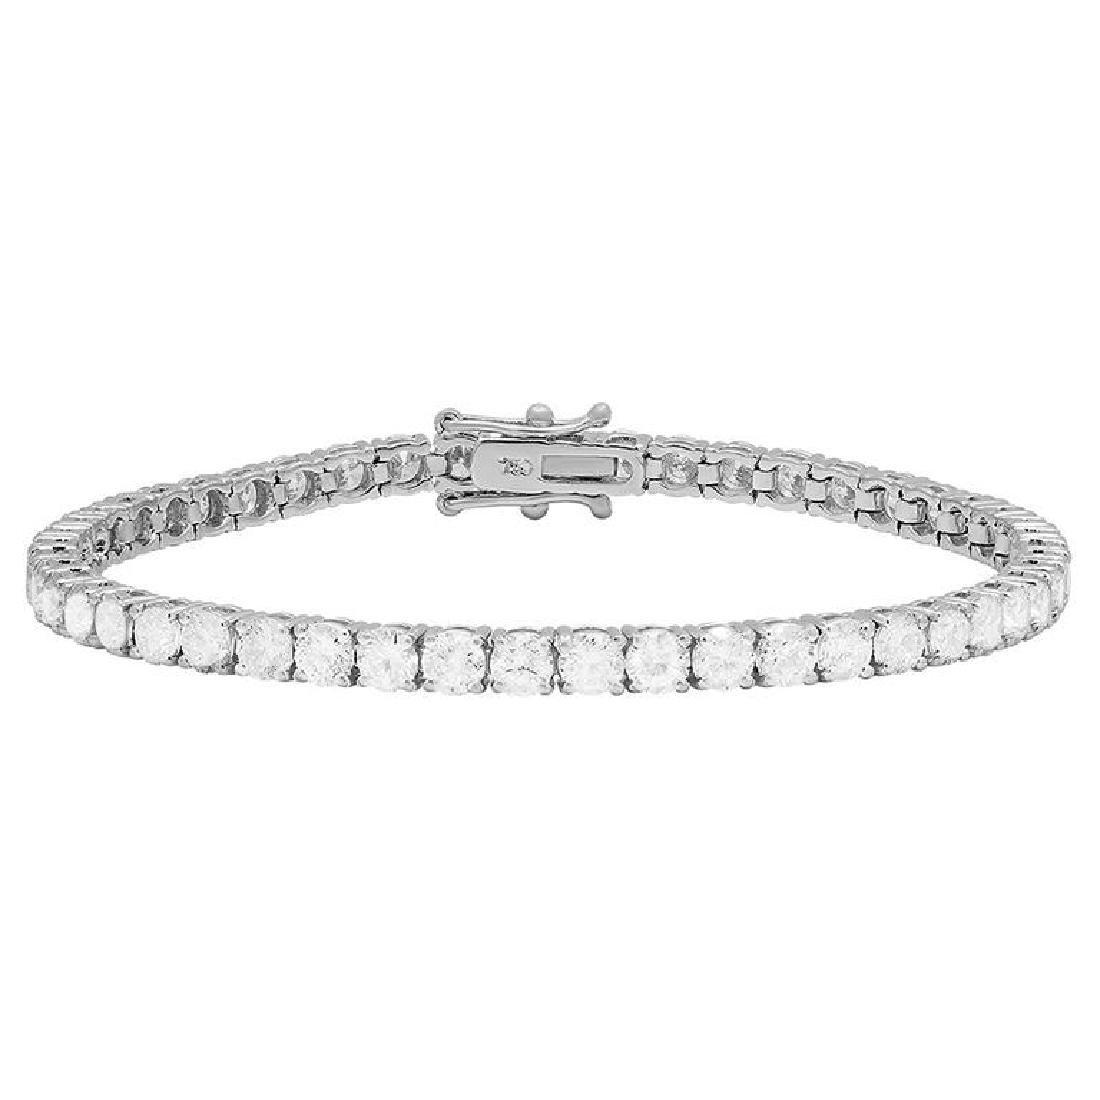 18k White Gold 8.18ct Diamond Tennis Bracelet